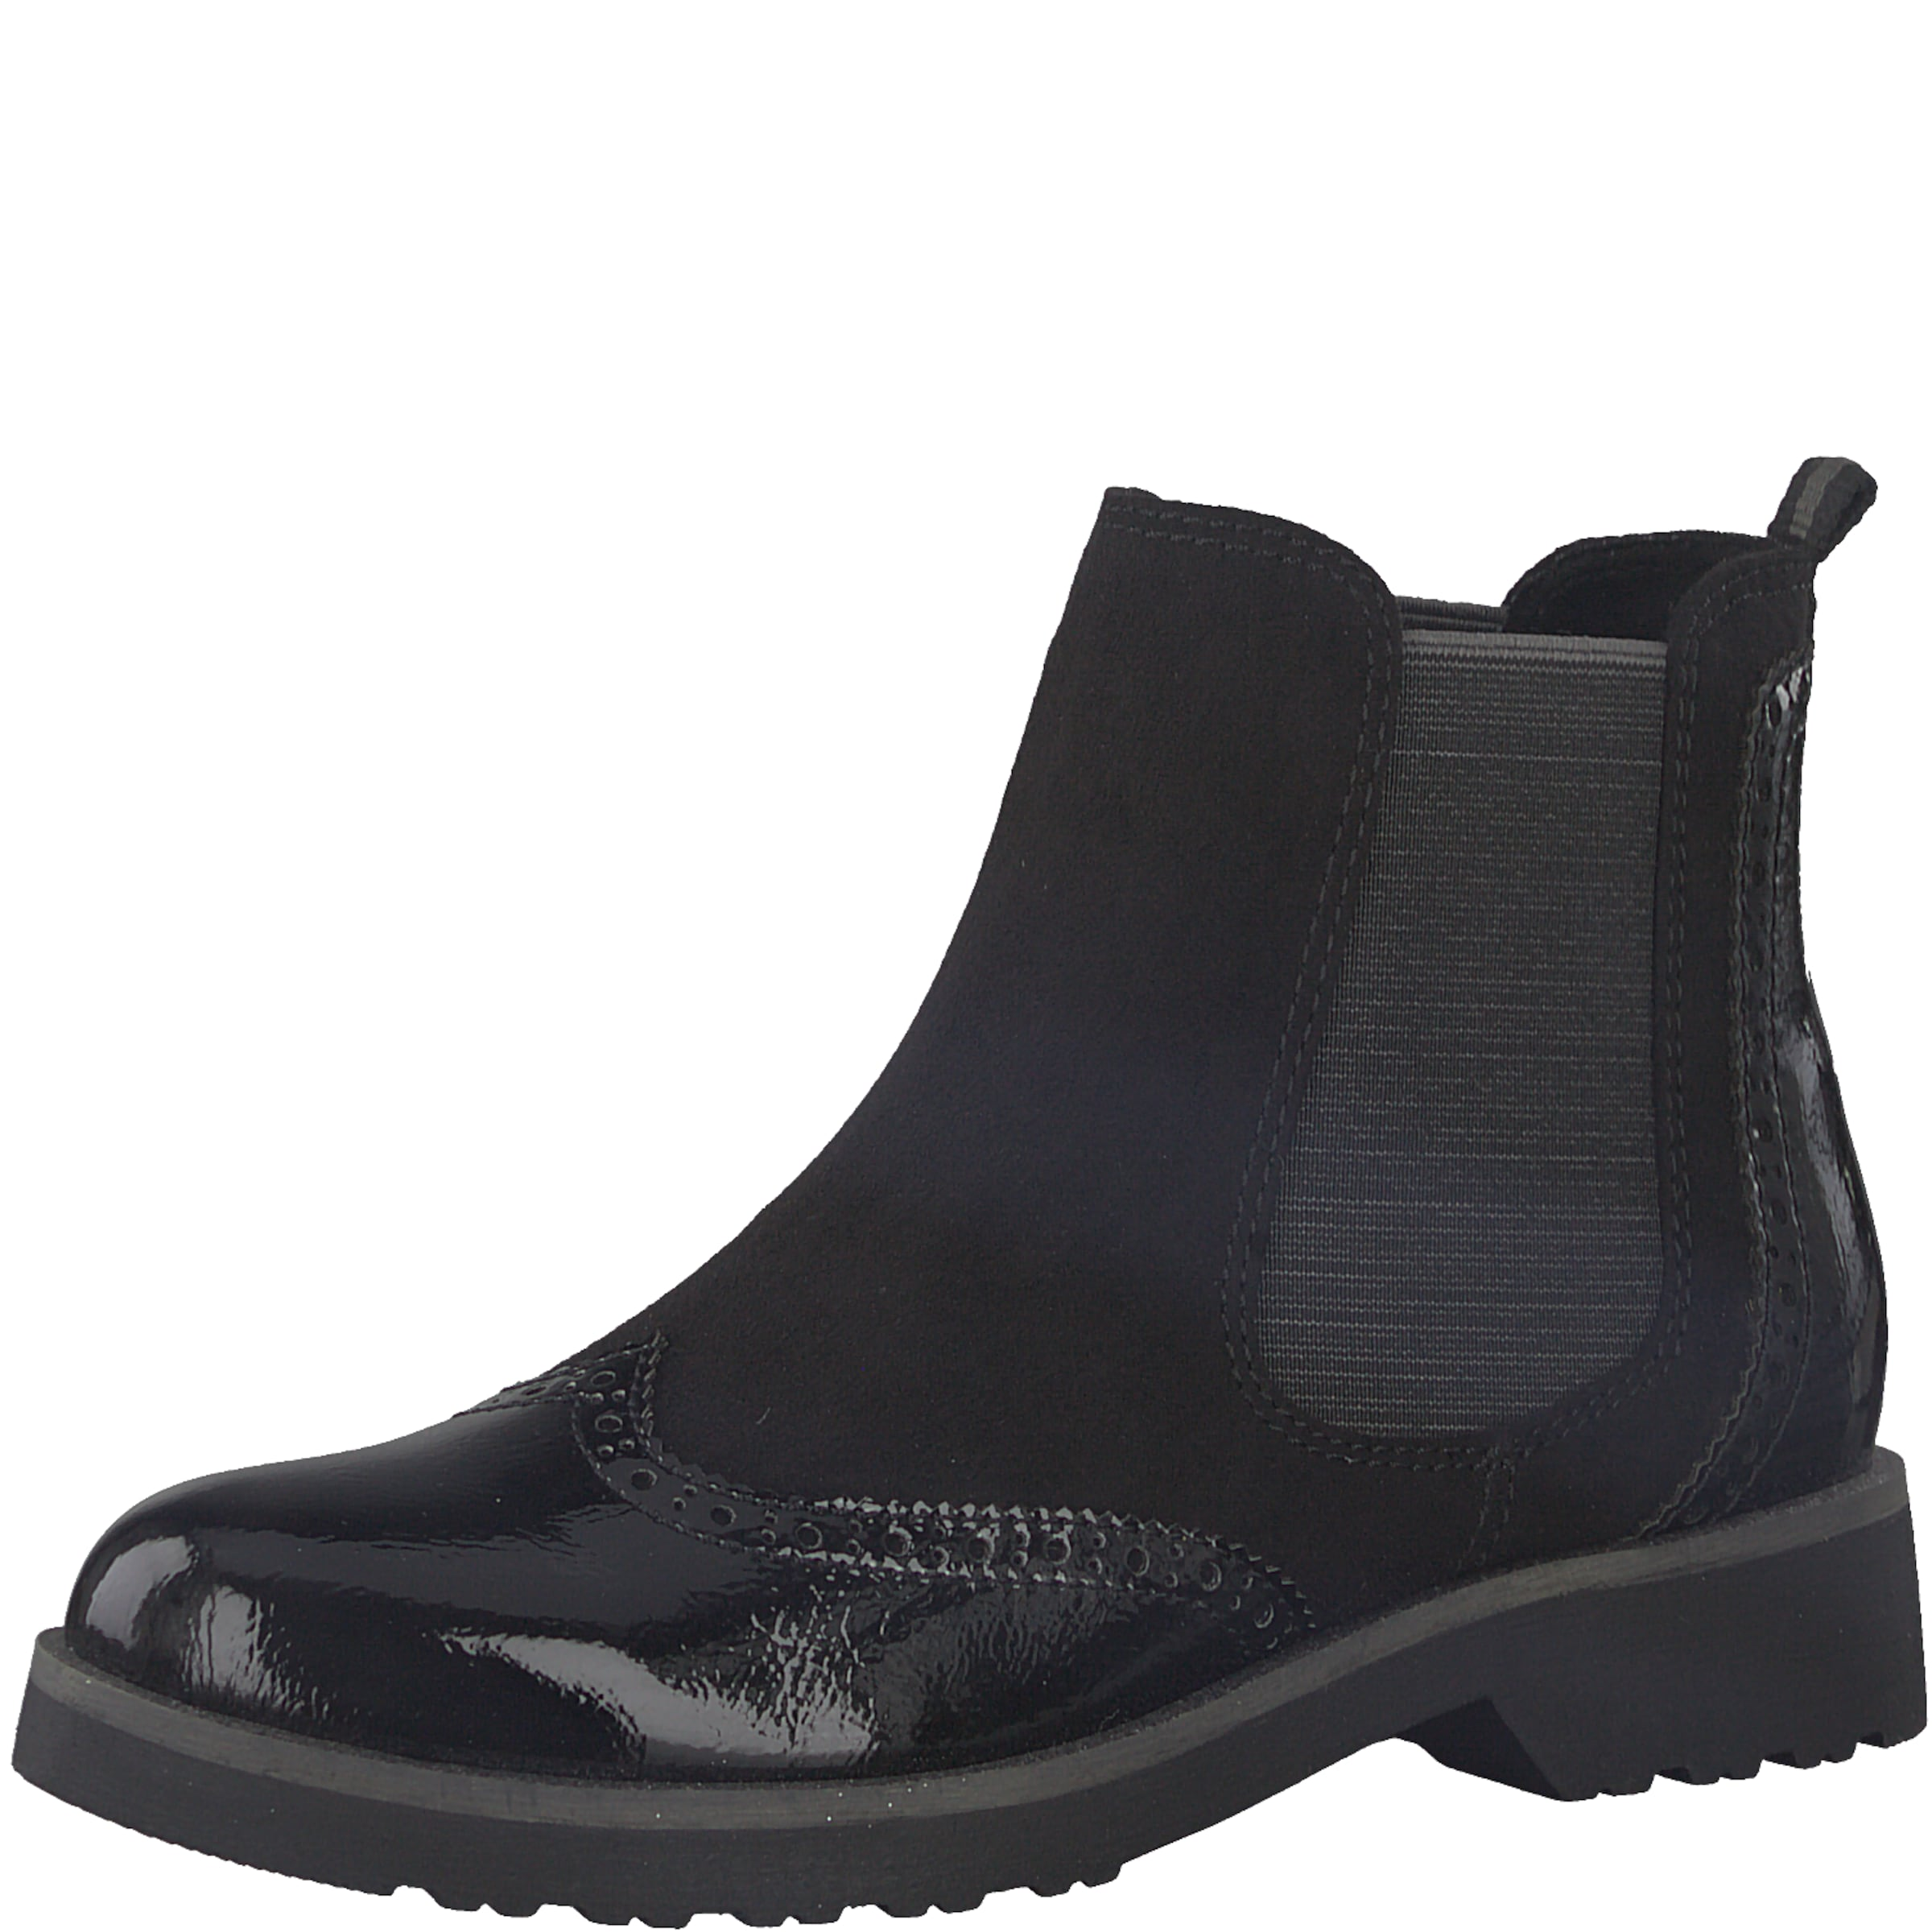 MARCO Chelsea-Stiefelette TOZZI Chelsea-Stiefelette MARCO Verschleißfeste billige Schuhe 1fb41e